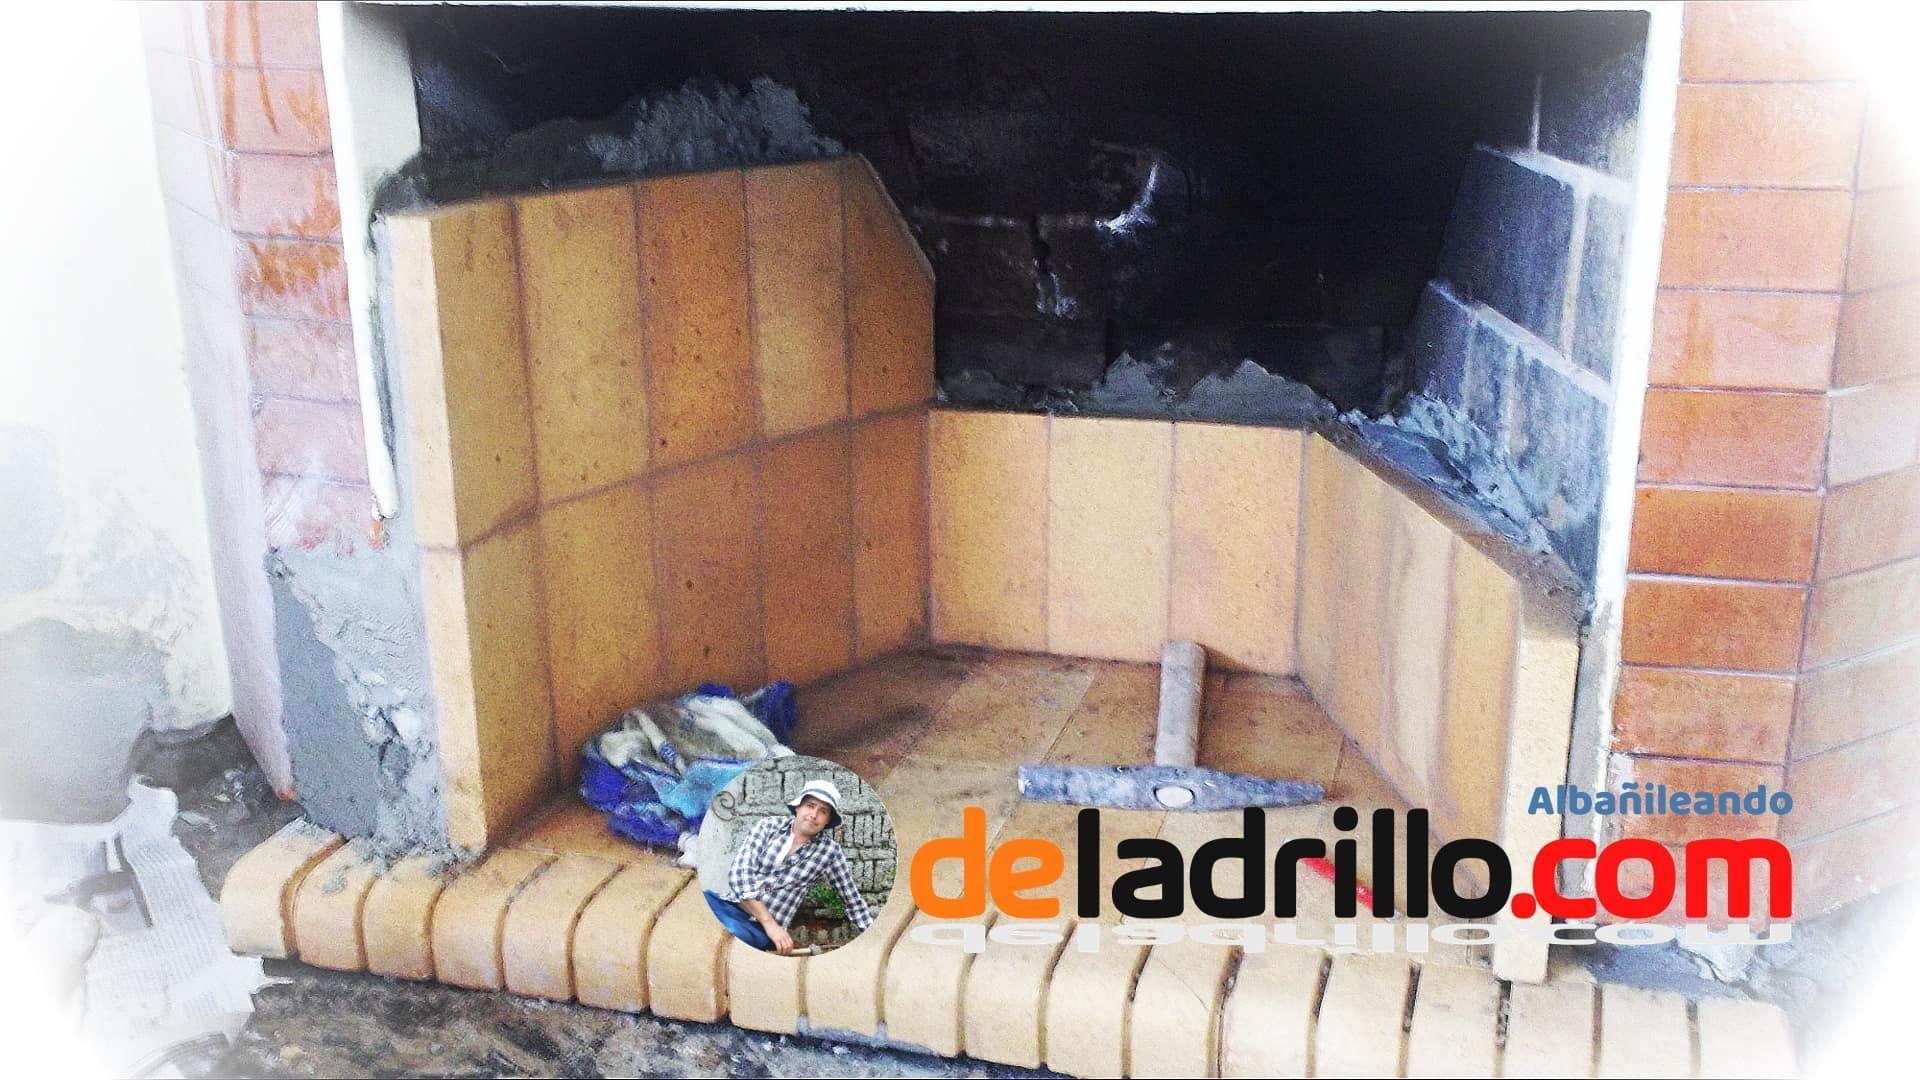 Remodelar La Chimenea Chimeneas Como Pegar Ladrillos Ladrillos Refractarios